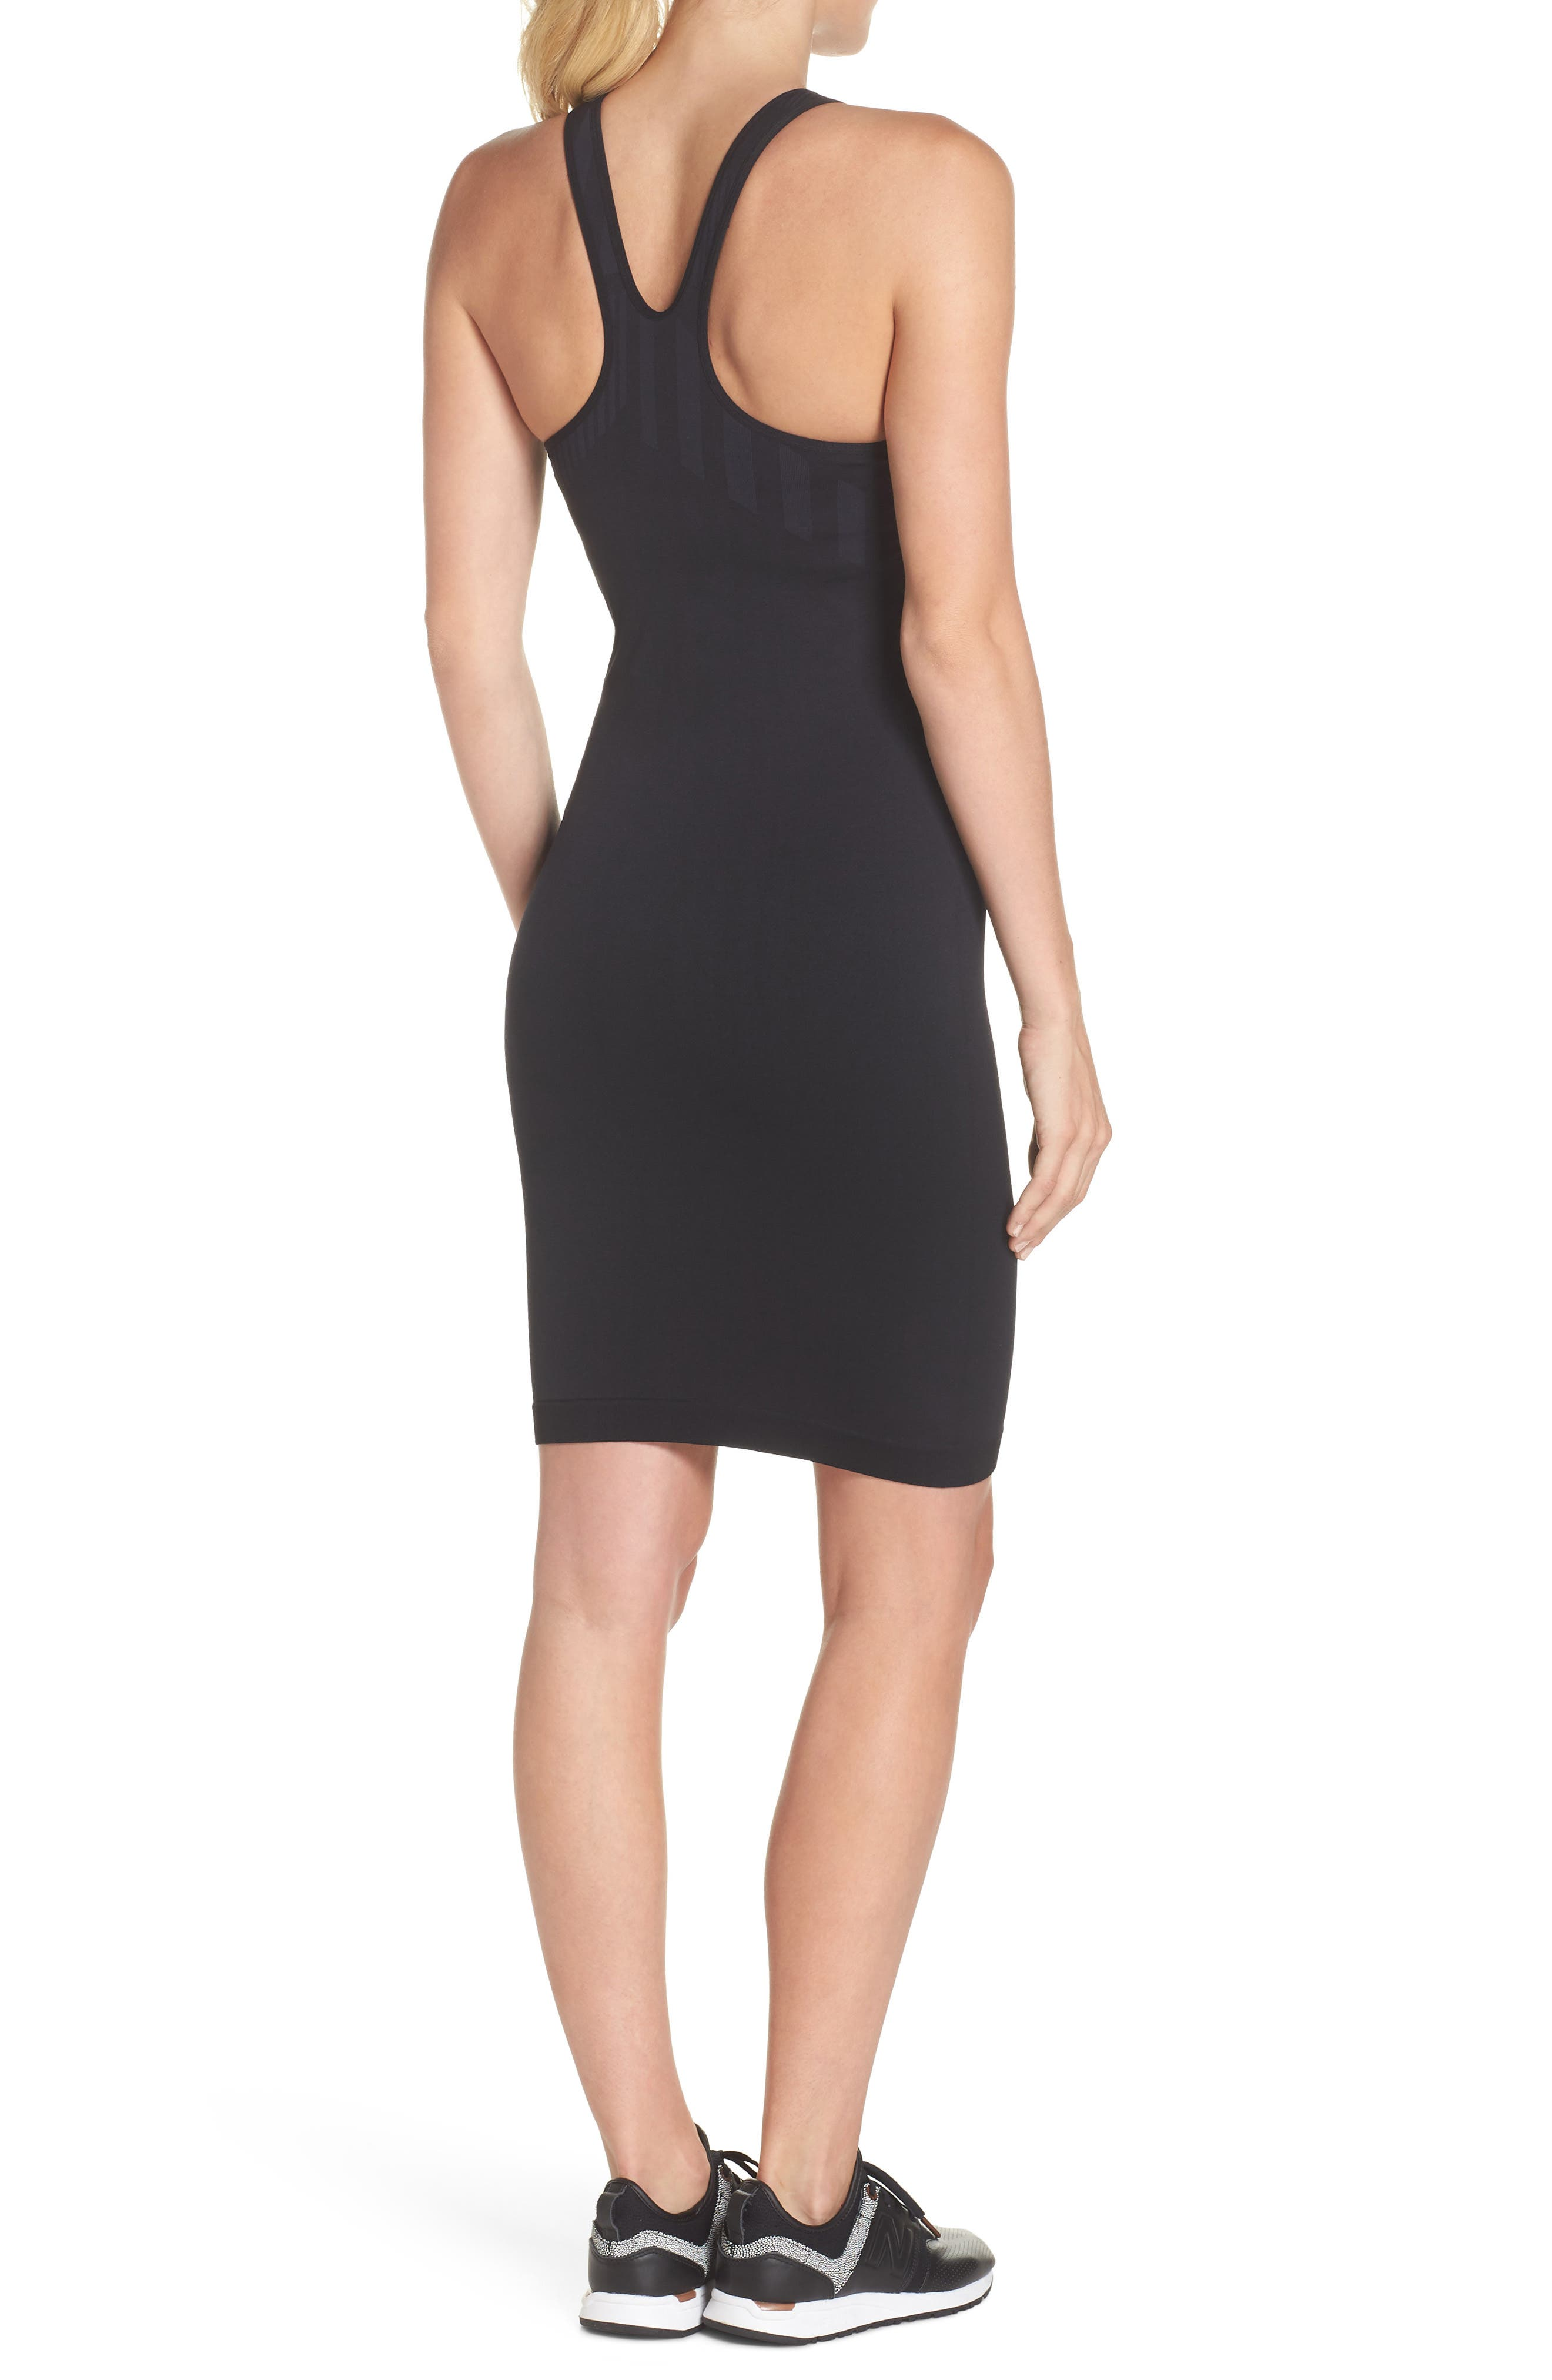 Spectrum Dress,                             Alternate thumbnail 2, color,                             Black